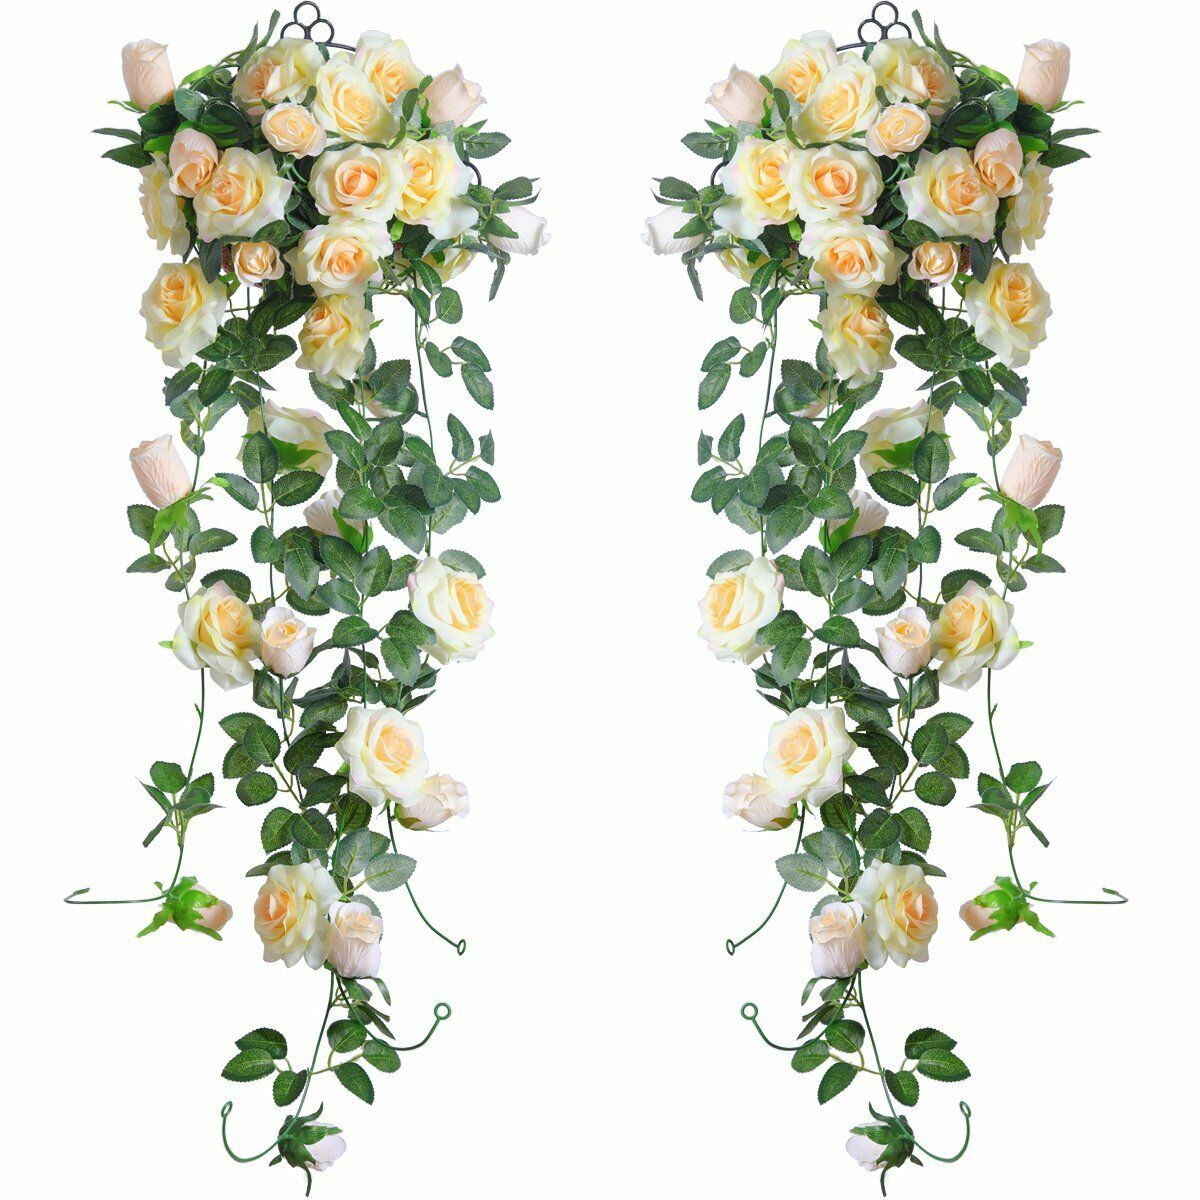 2 X Artificial Rose Vine Silk Flower Garland Hanging Plants Home